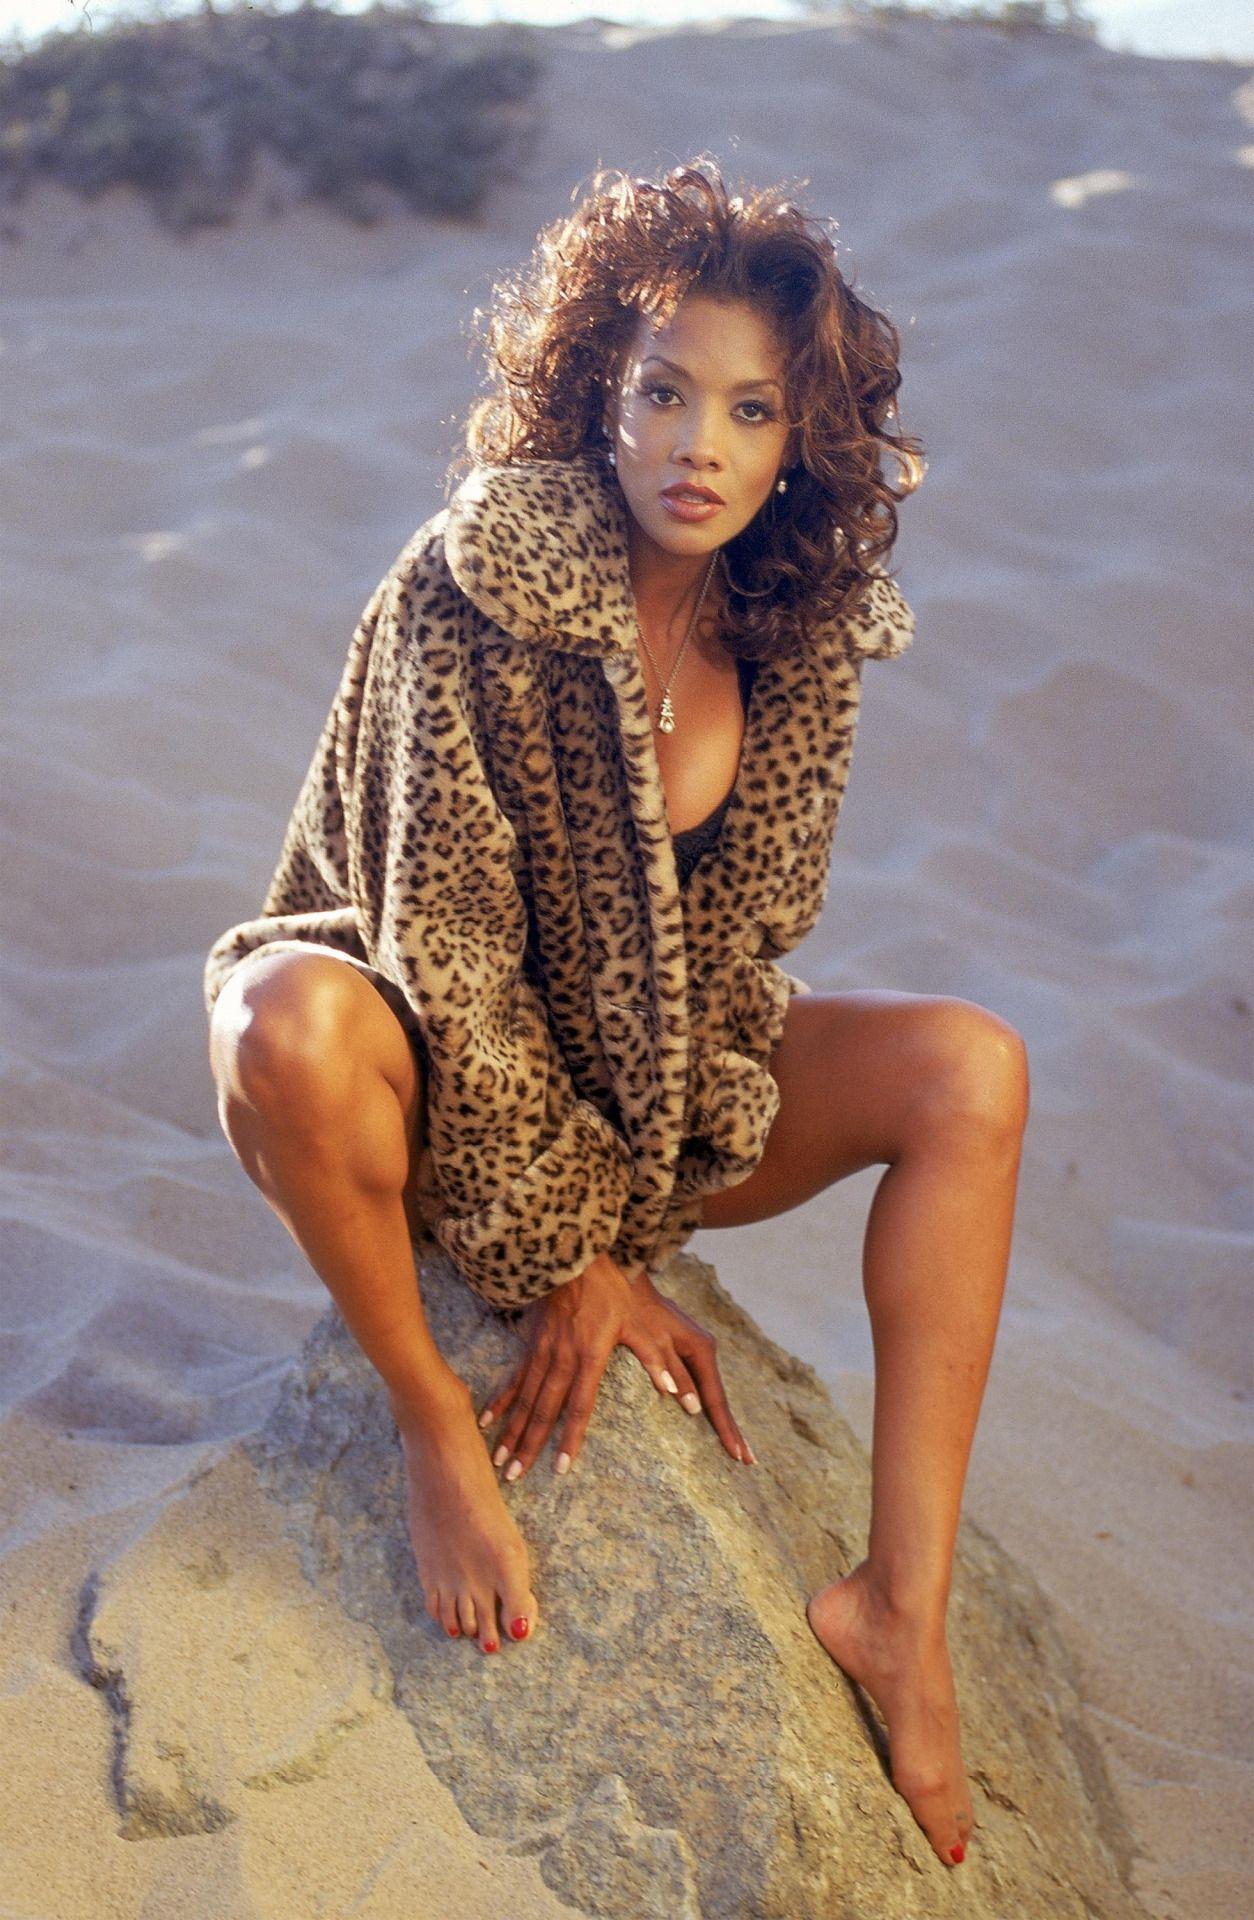 Sexy Vivica A. Fox nudes (75 photos), Topless, Cleavage, Feet, see through 2020